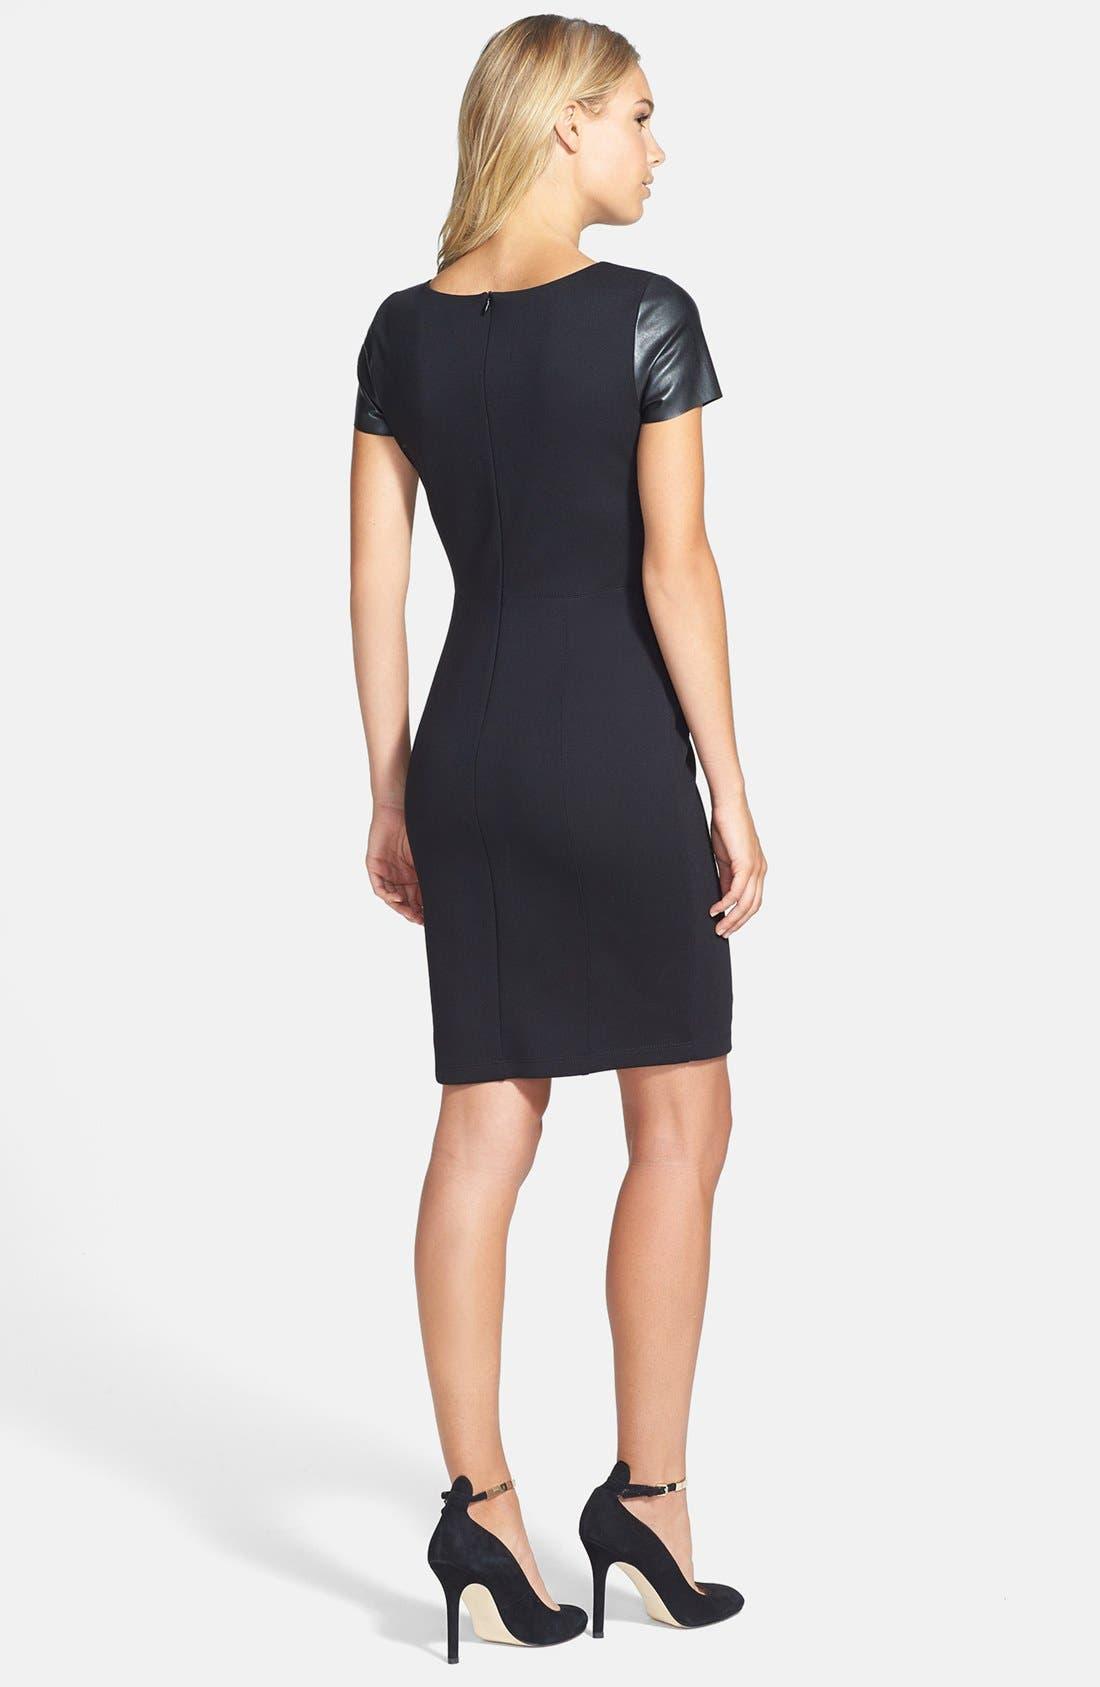 Alternate Image 3  - B44 Dressed by Bailey 44 'Fashion Doll' Faux Leather Sleeves Sheath Dress